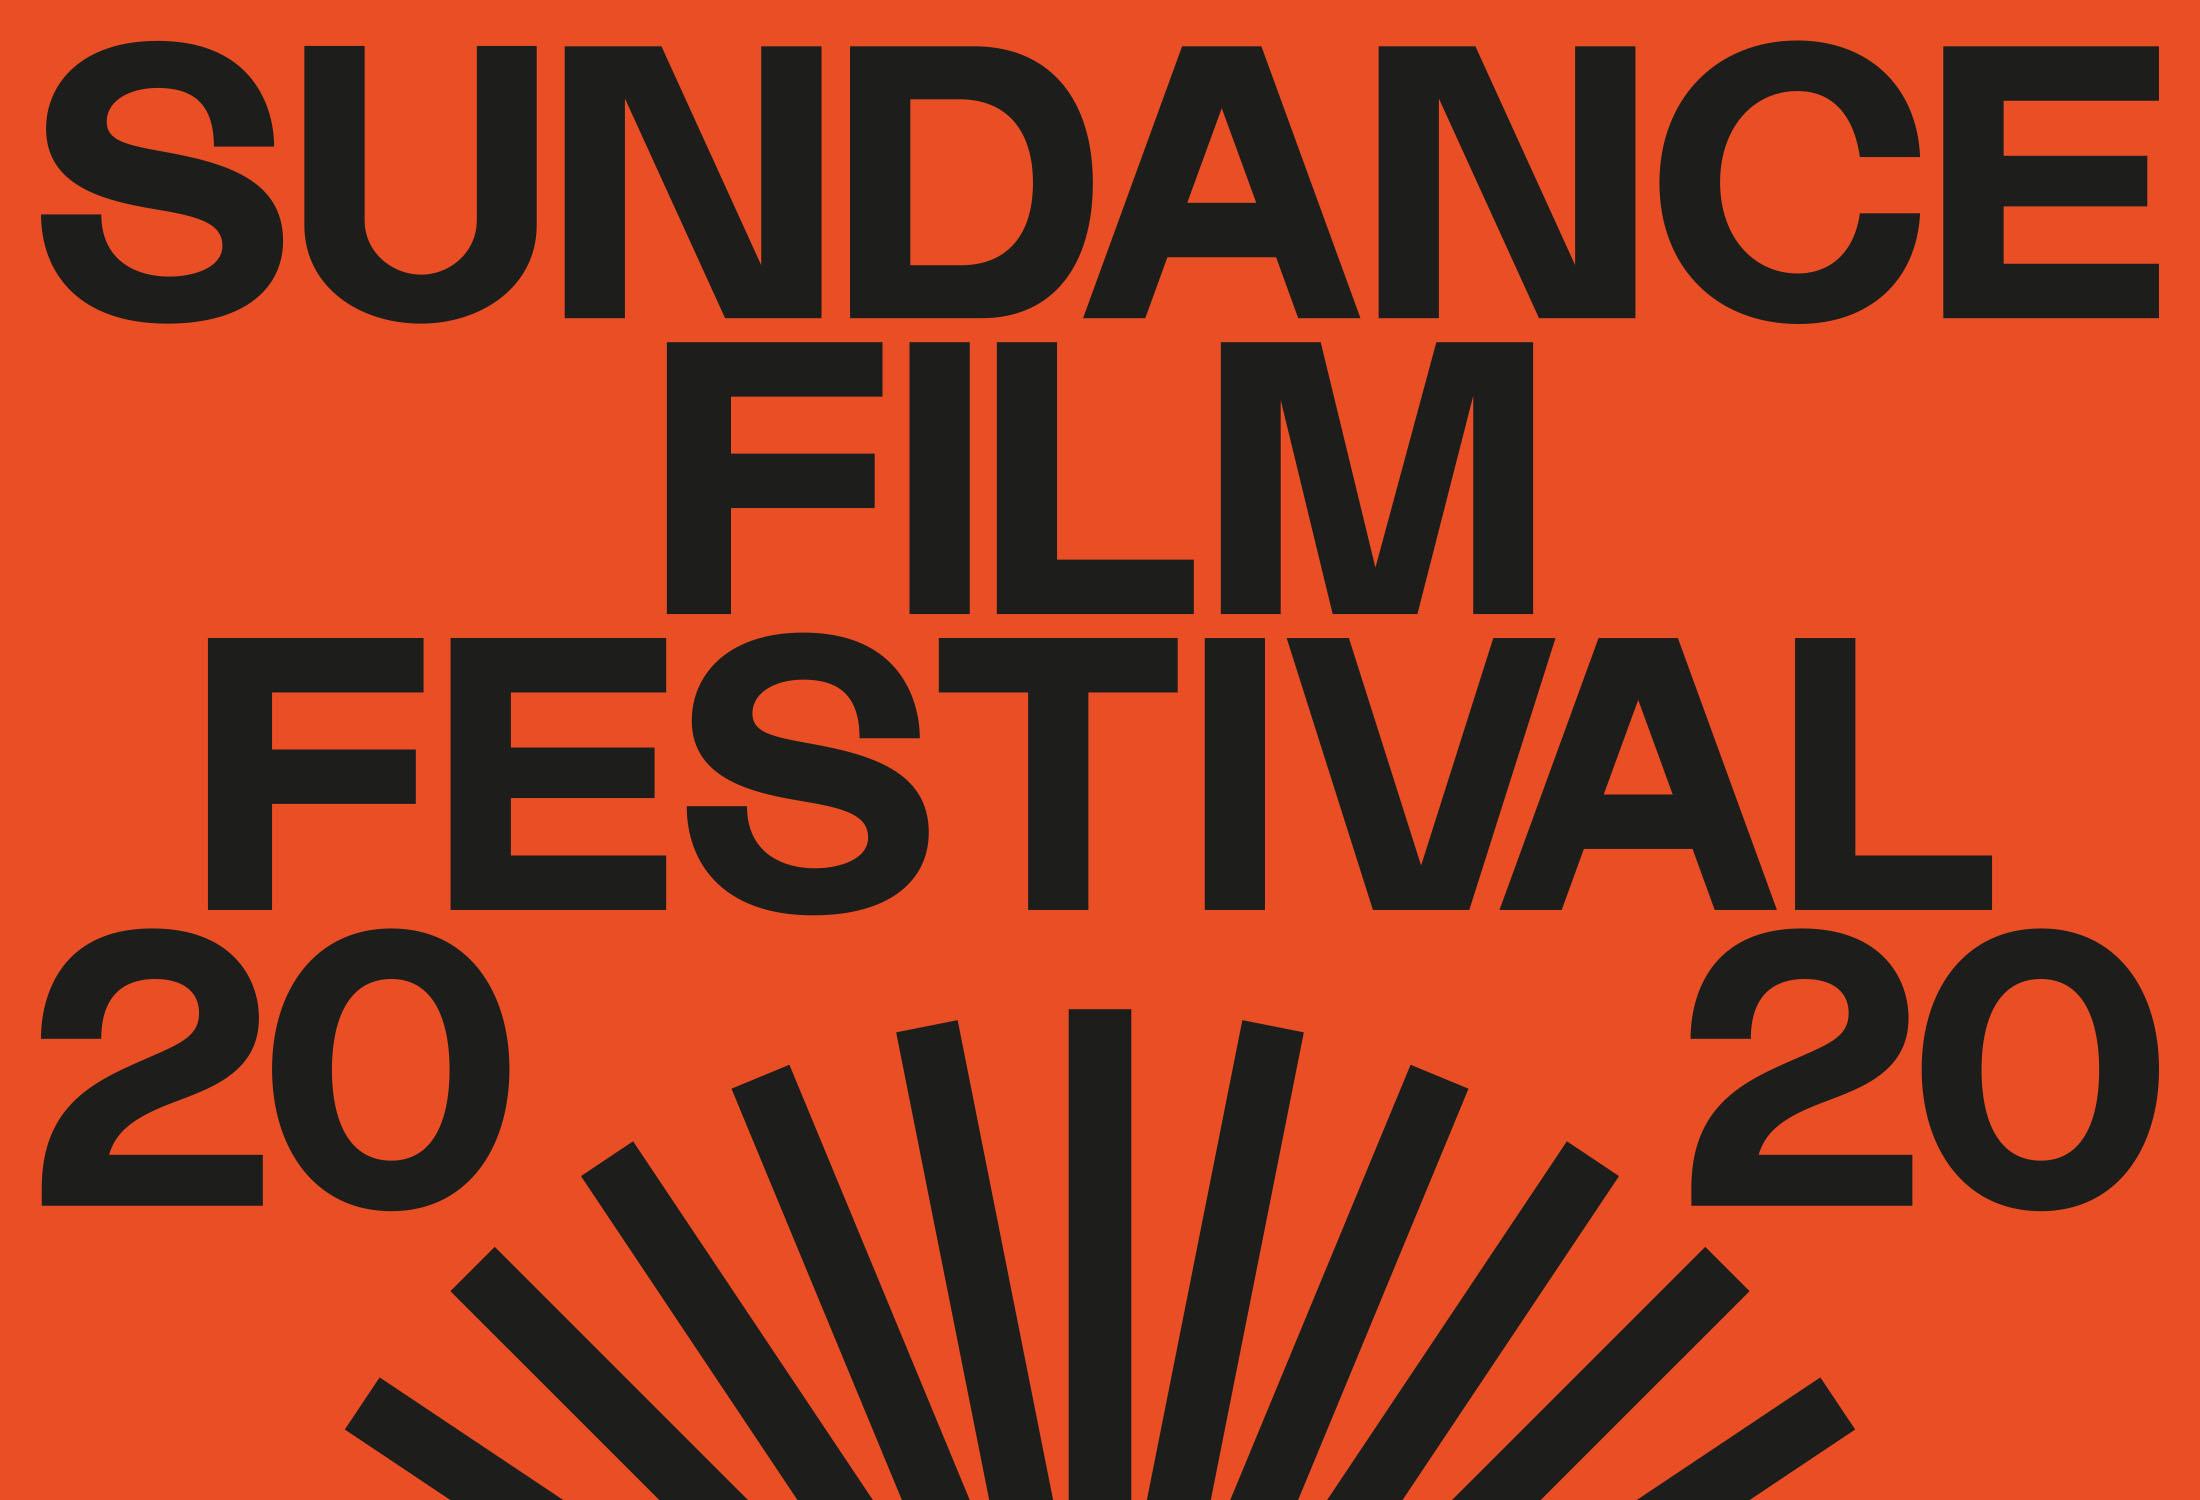 Sundance Film Festival declares 2020 program